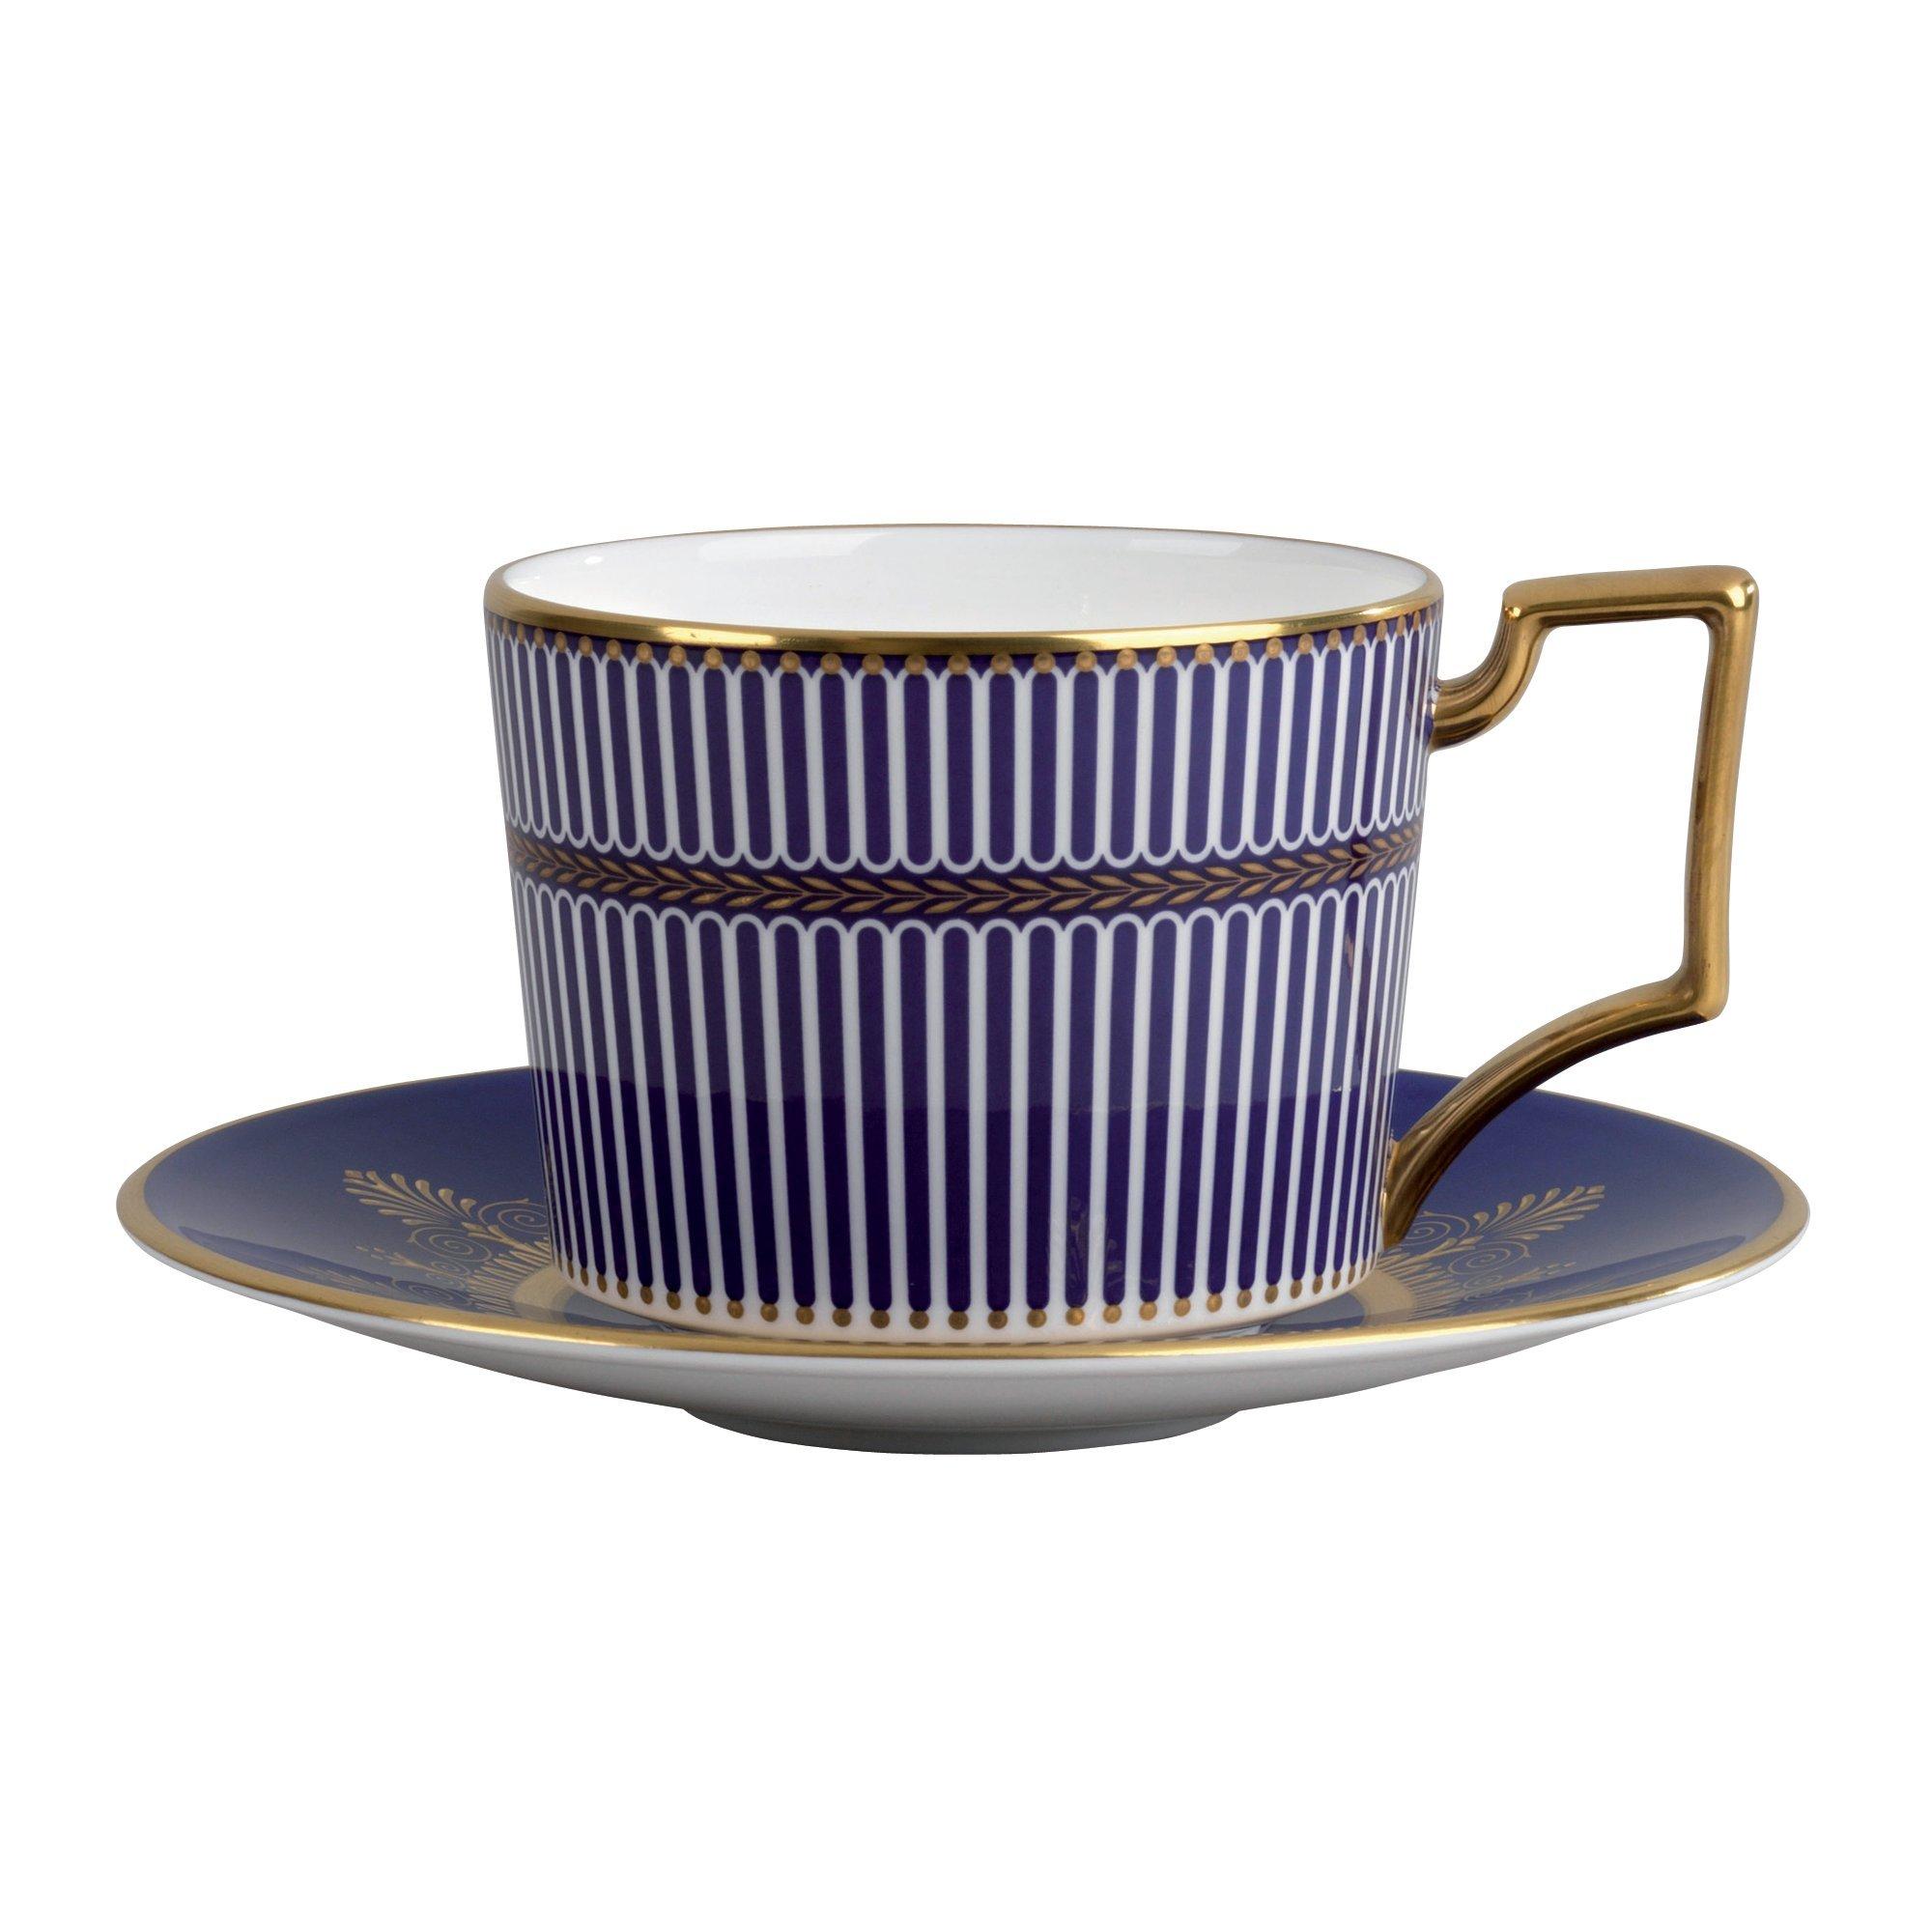 Wedgwood Anthemion Tea Saucer, Blue